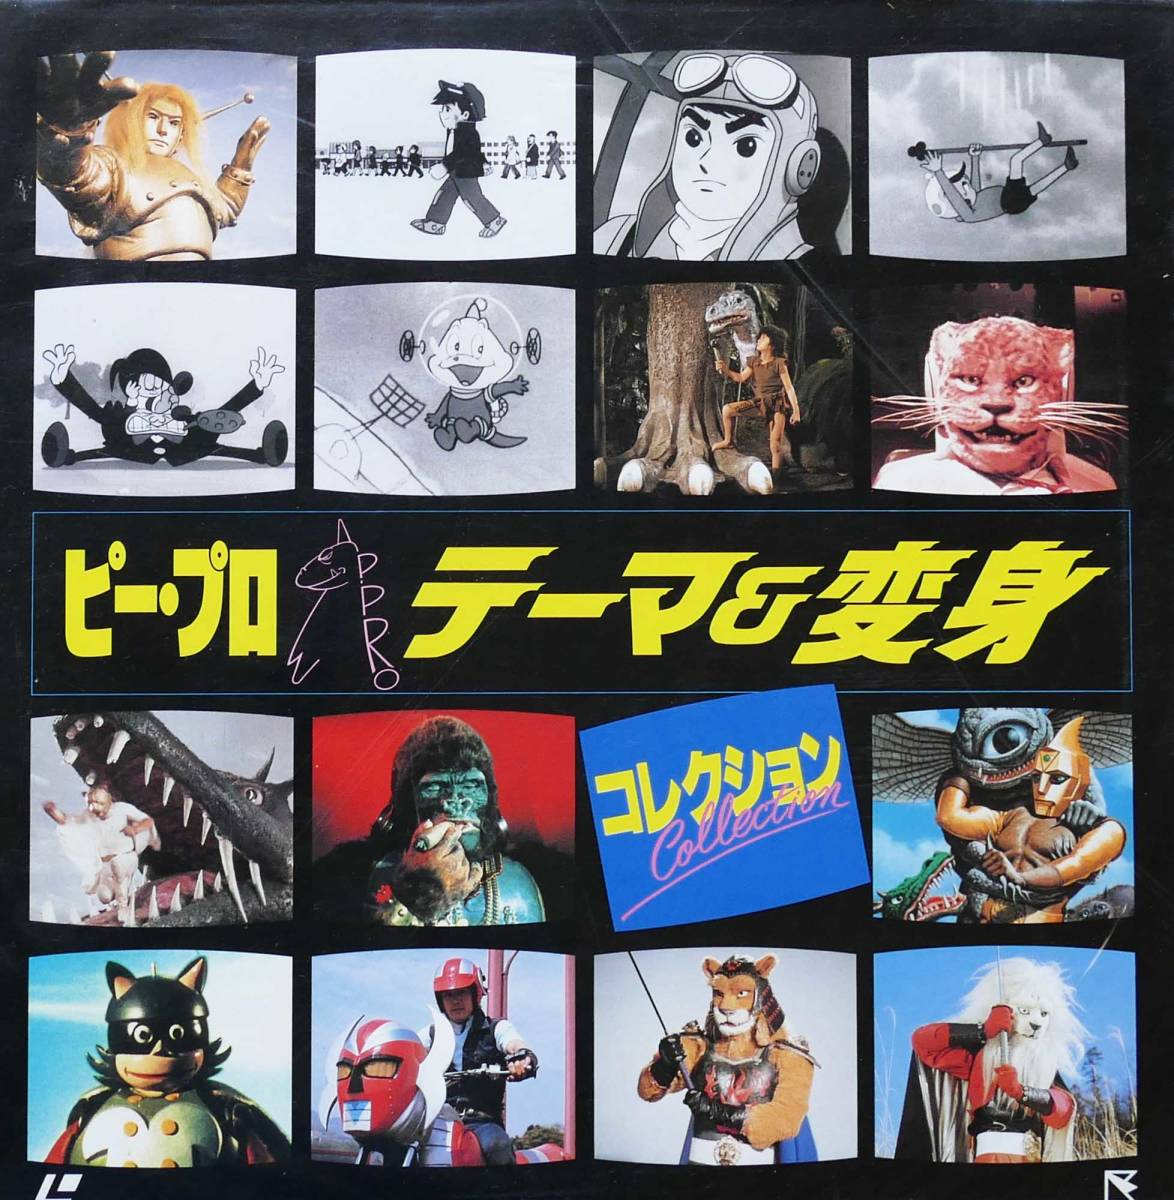 LD 特撮セット 「ピープロテーマ変身」「サンダーバードヒストリー」「ウルトラマンZOFFY」「東映特撮主題歌全集2」怪獣大決戦など9枚組